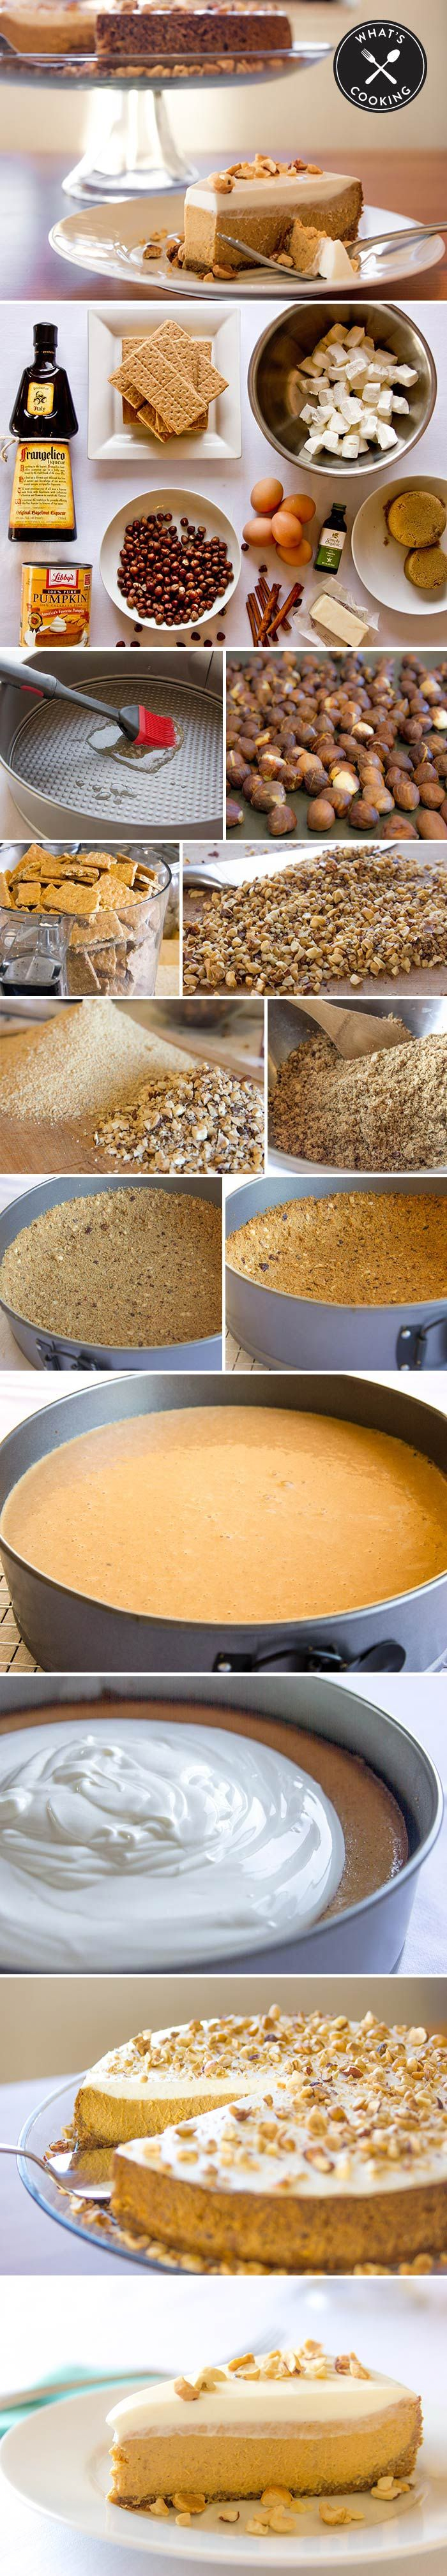 Delicious! Nordstrom's Pumpkin Cheesecake Recipe